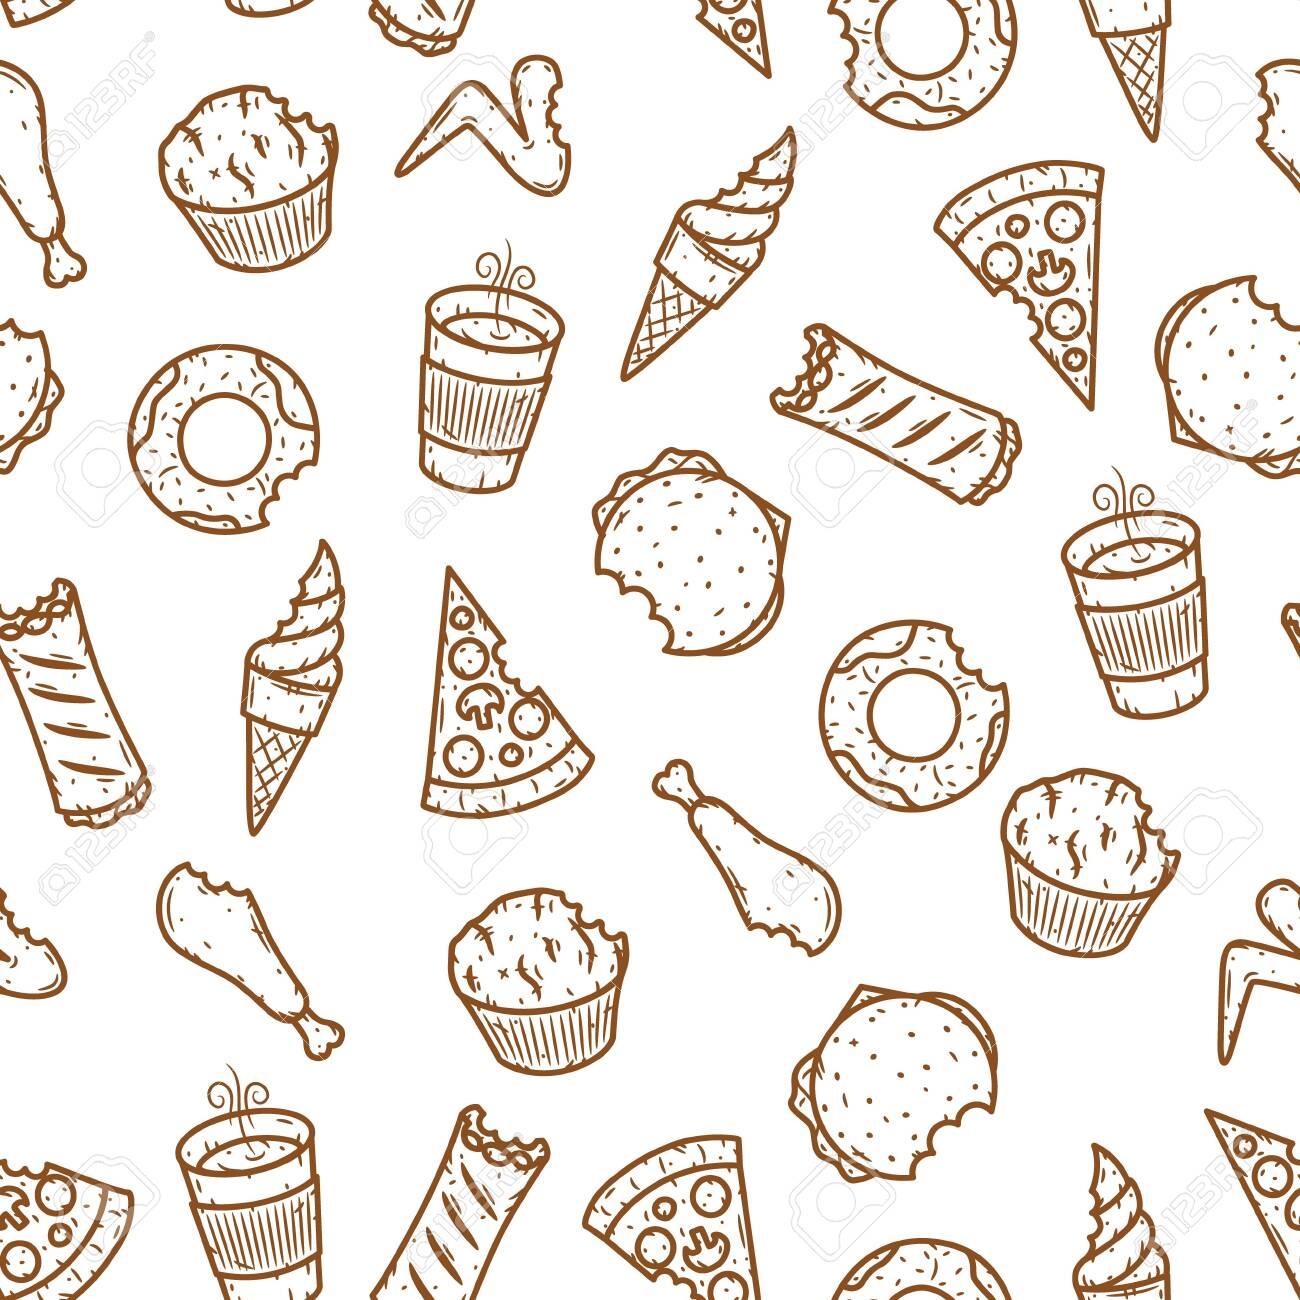 Seamless fast food pattern. Vector fast food pattern. - 148507015